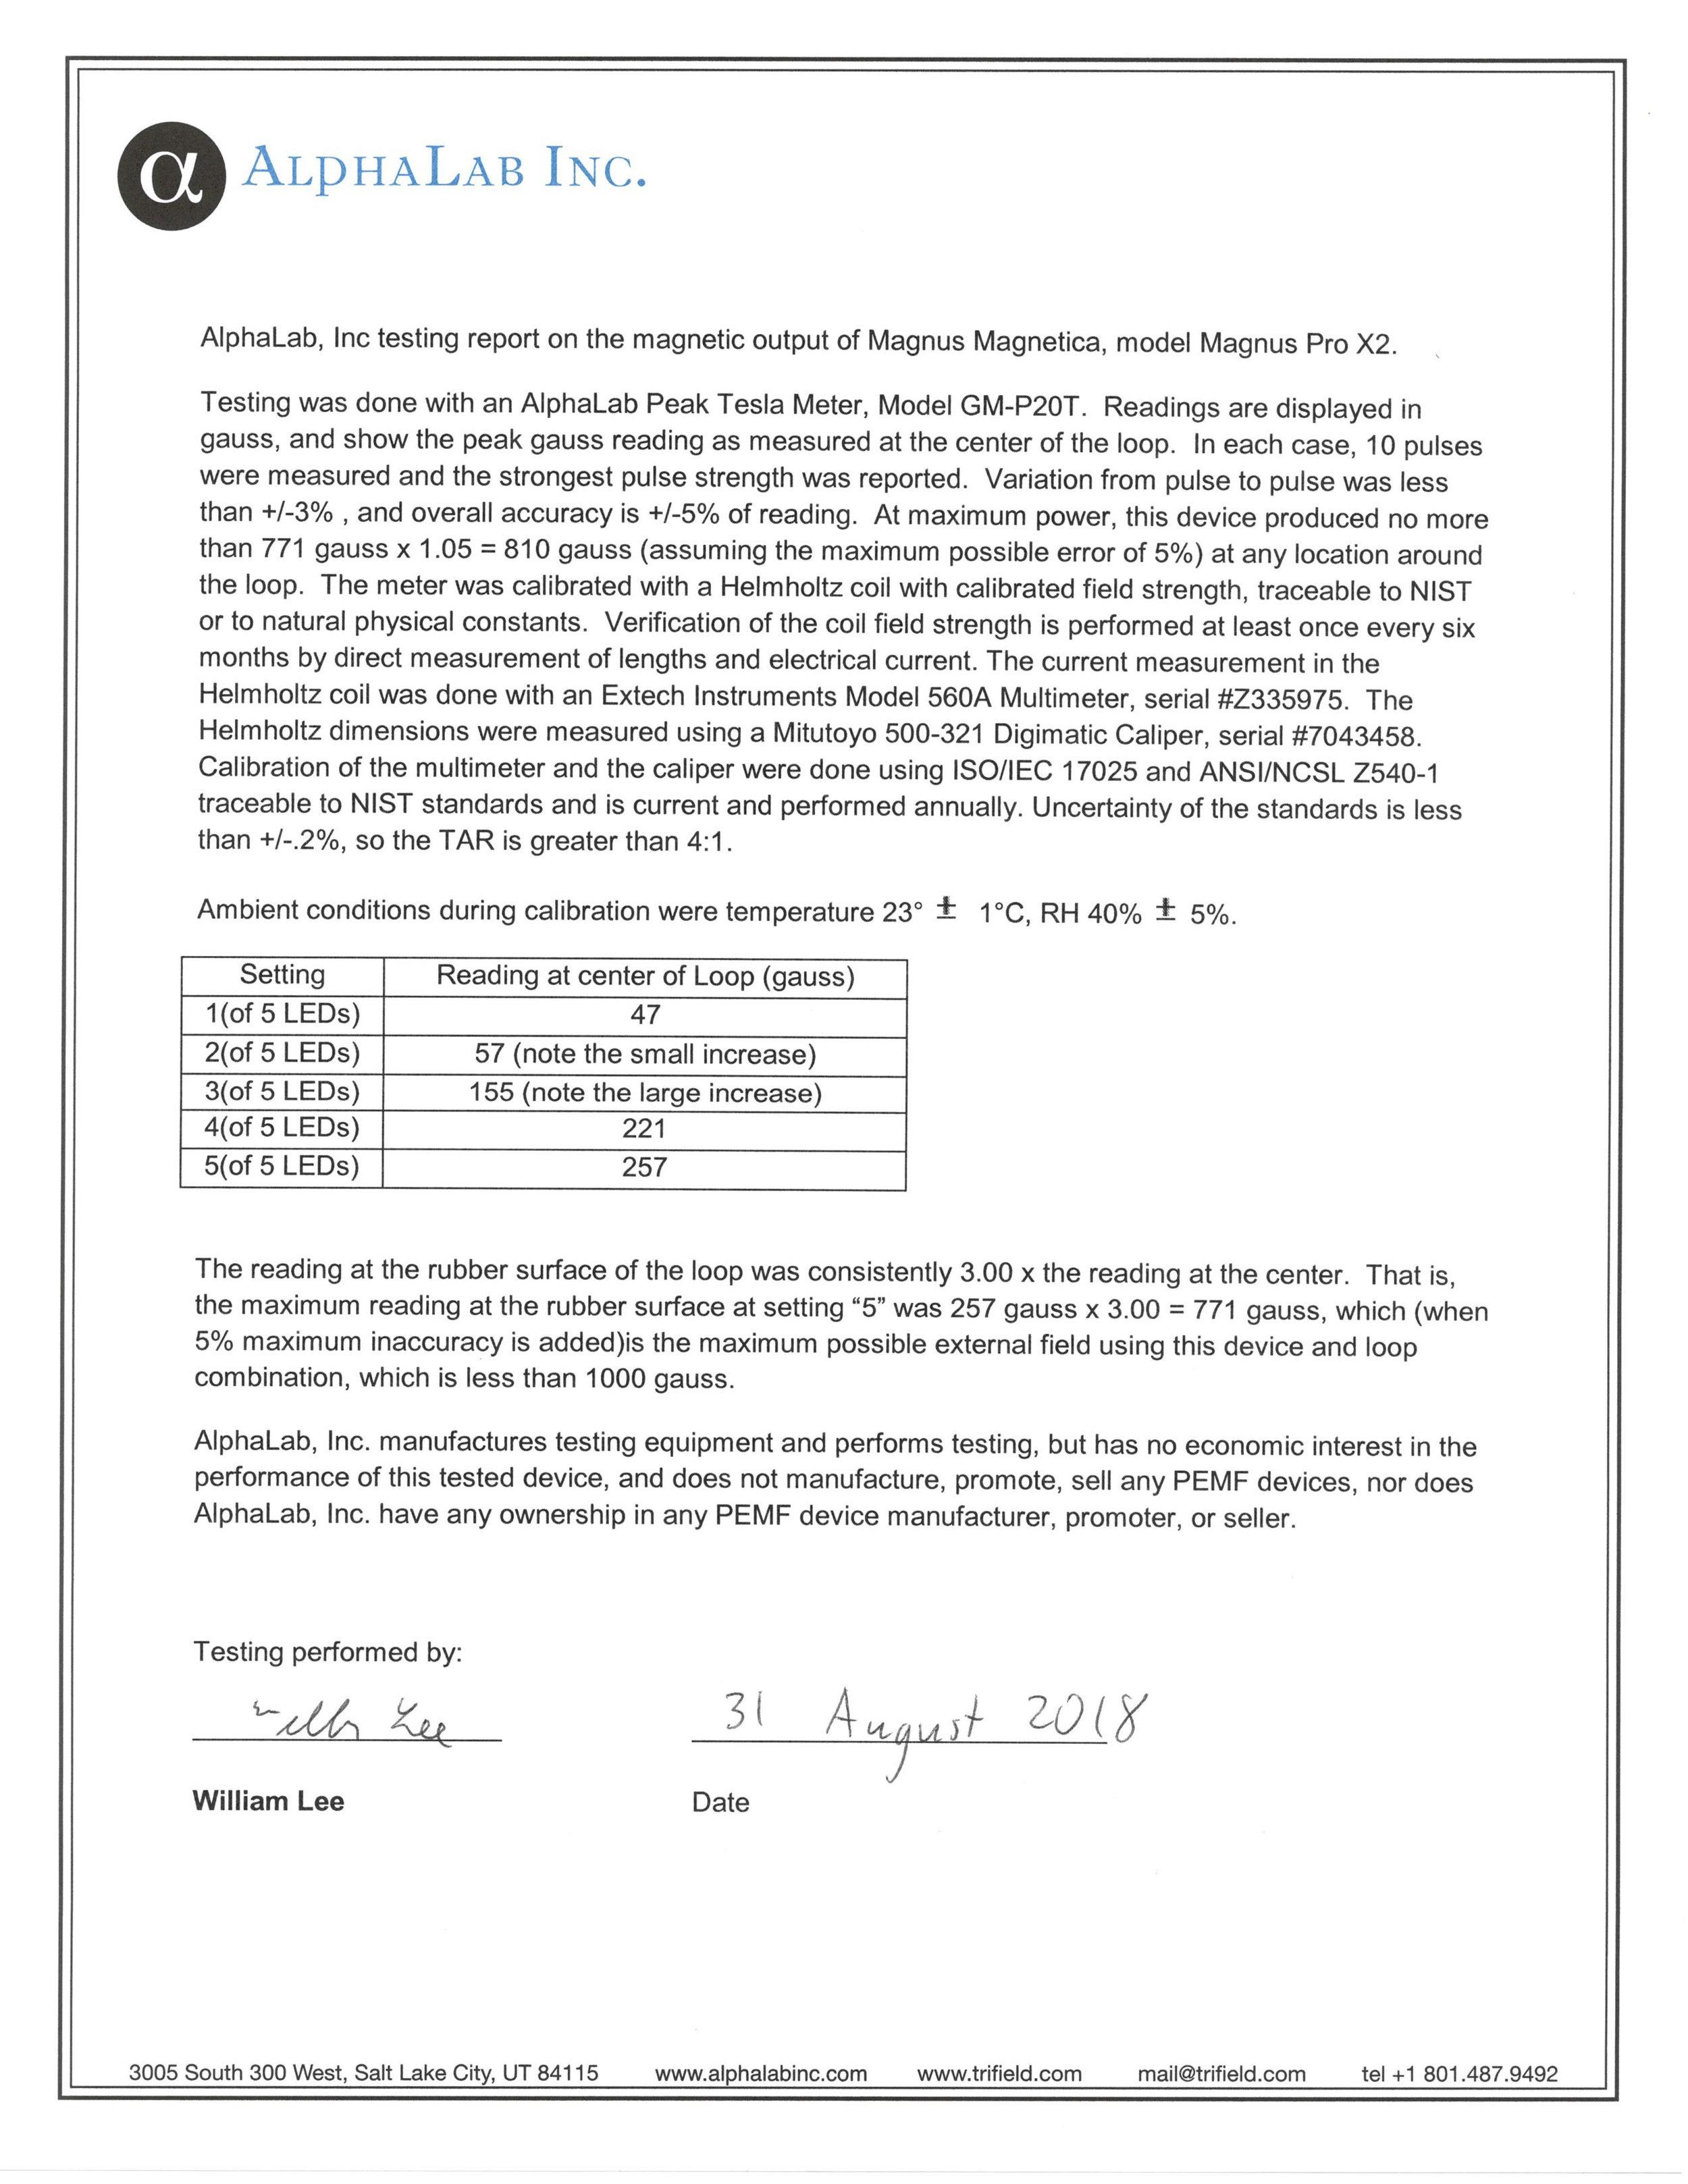 Magnus Pro X2 / AlphaLab Gauss Output Certification Report